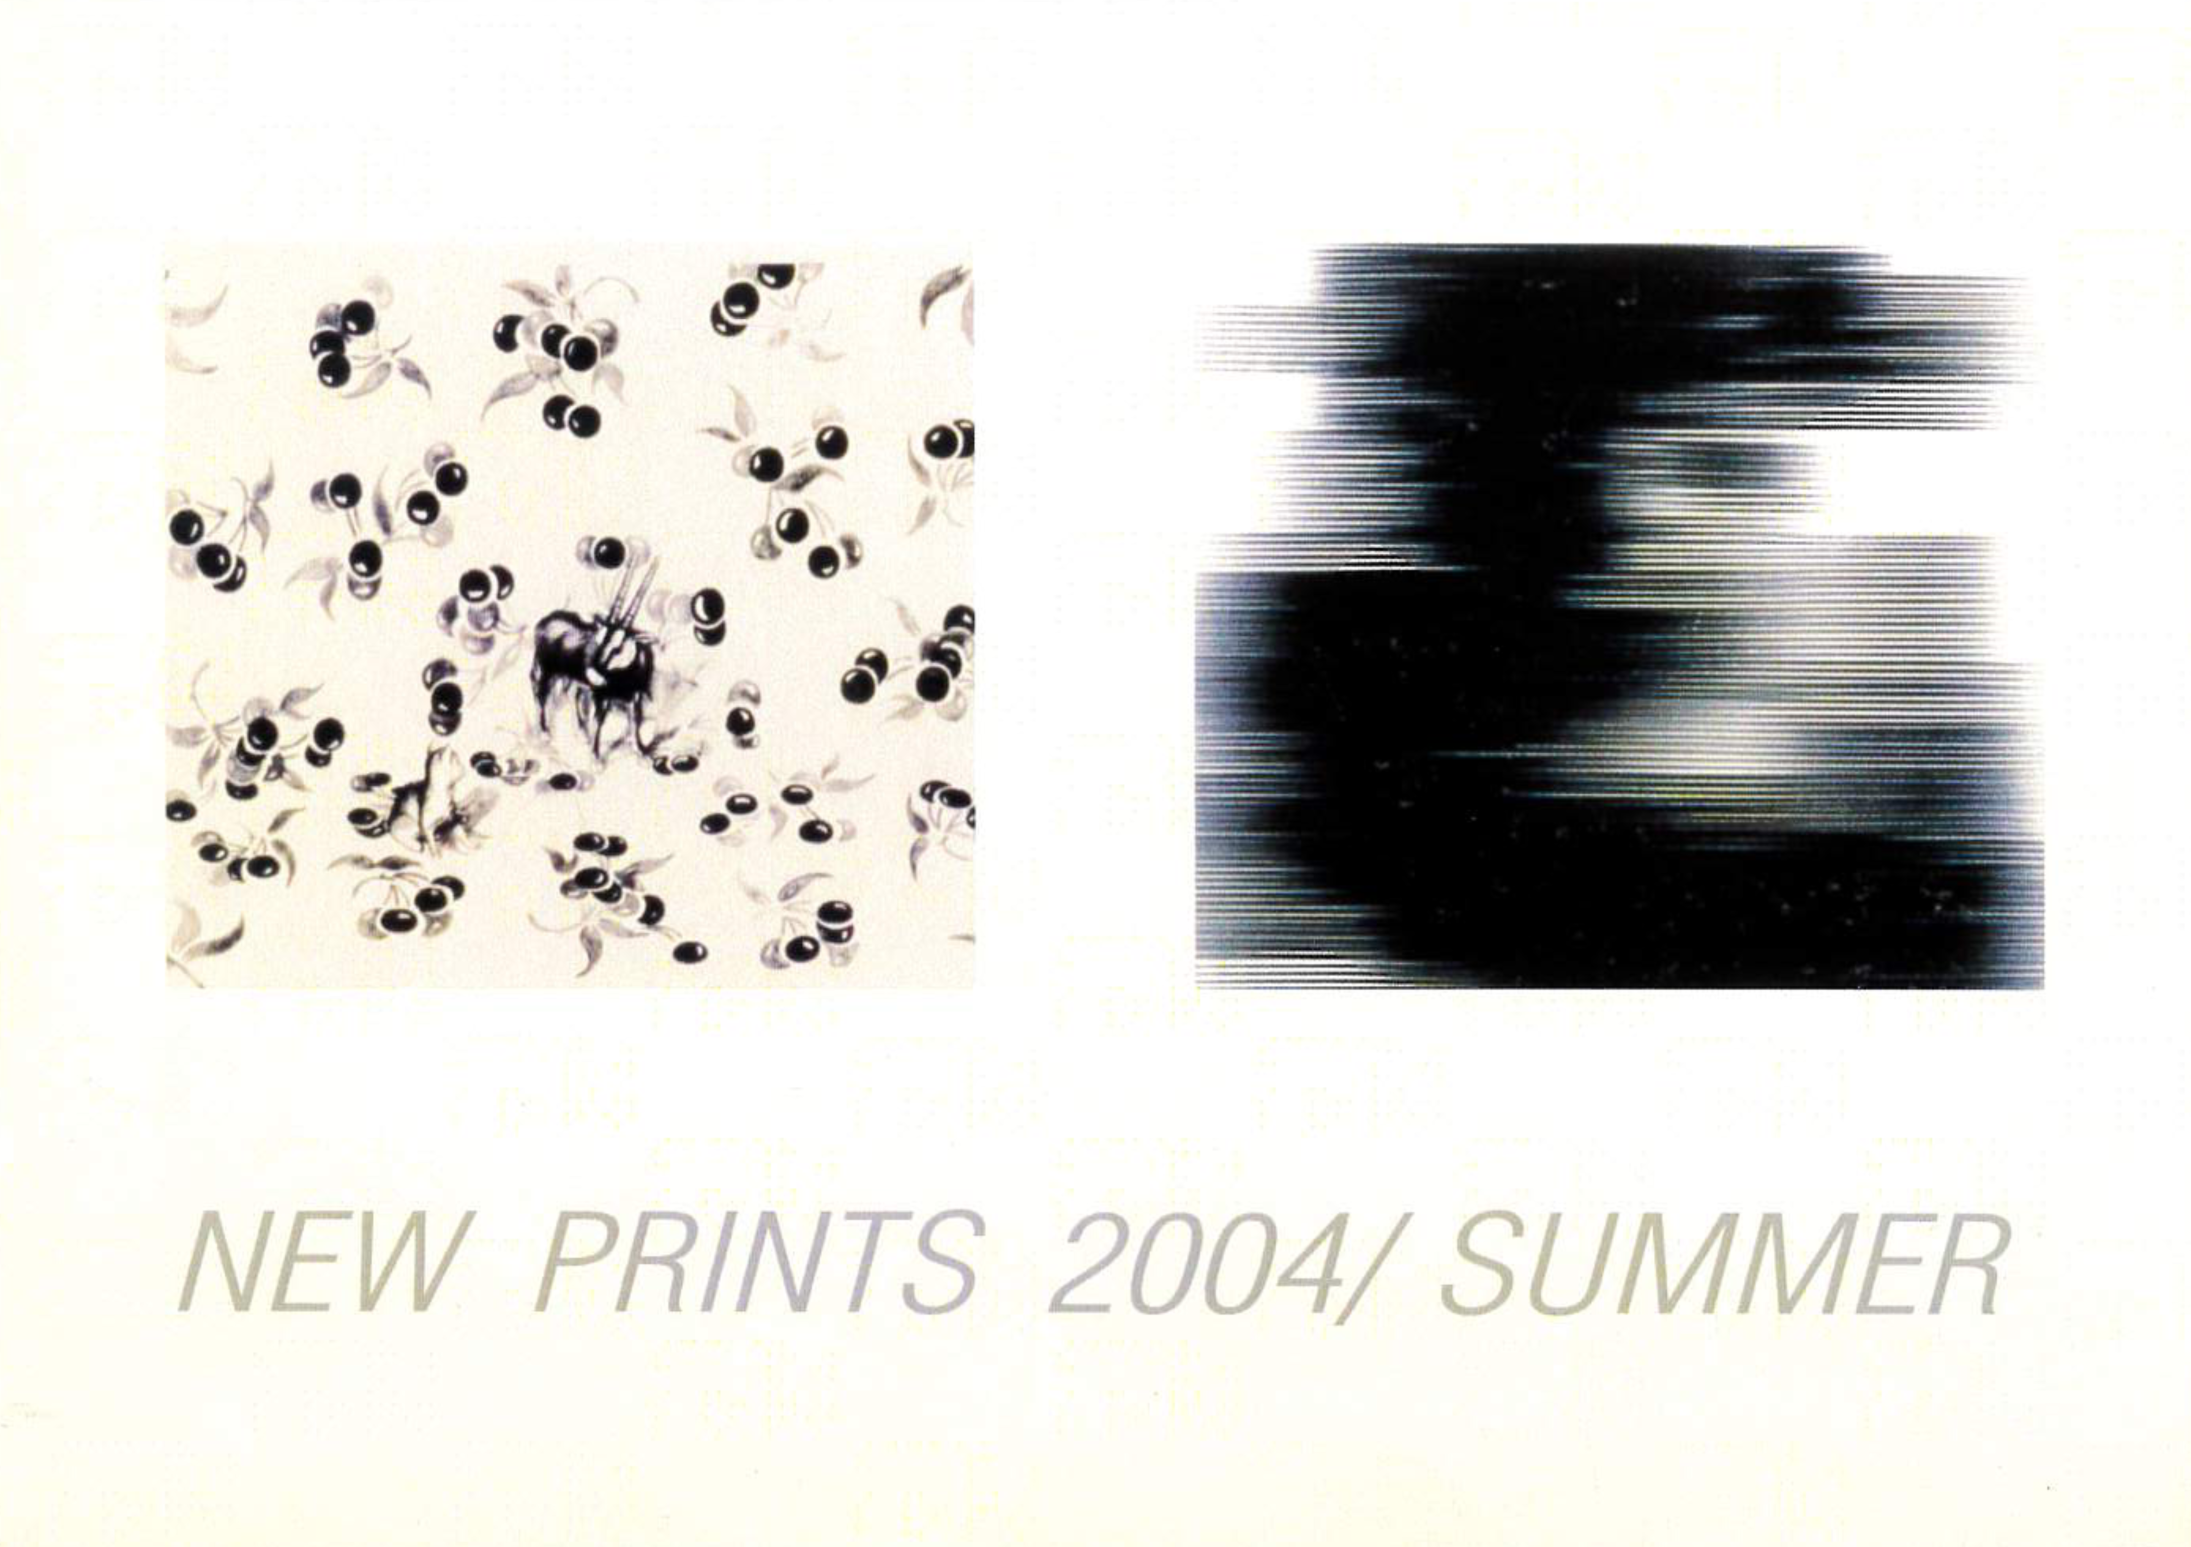 New Prints_2004 Summer.png